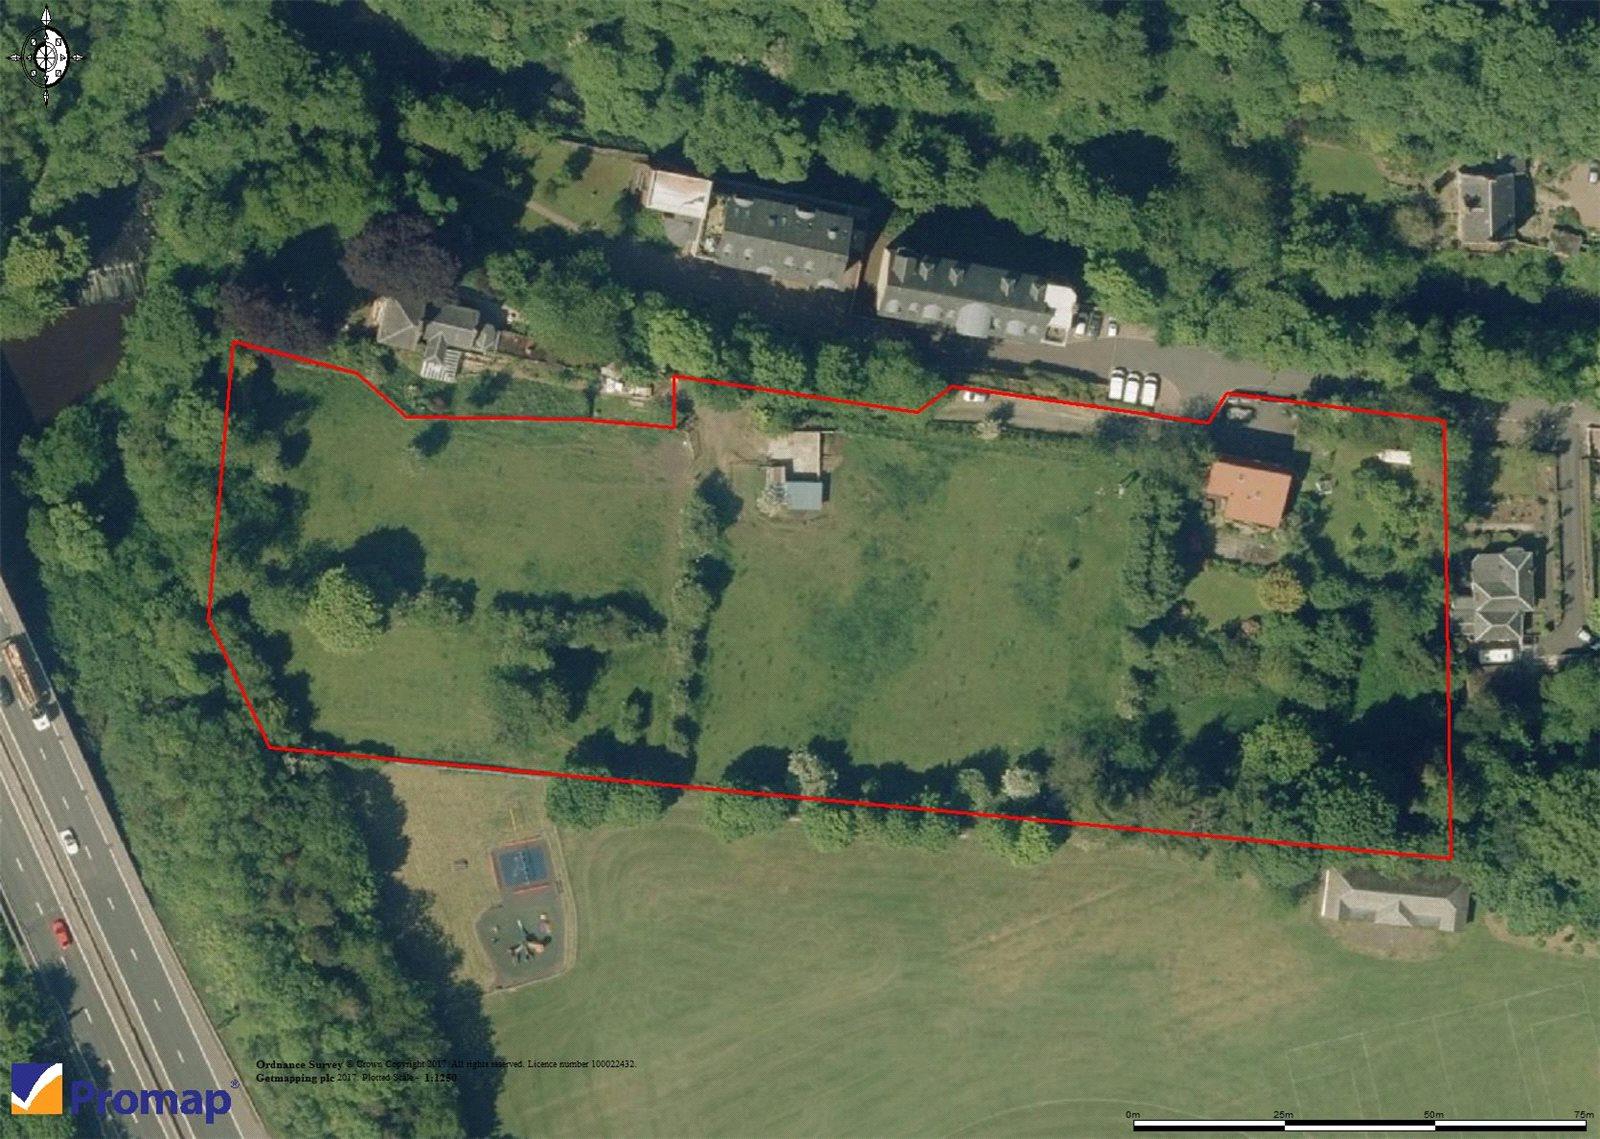 Land / Lot for Sale at Land At West Mill Road, Colinton, Edinburgh, EH13 Edinburgh, Scotland